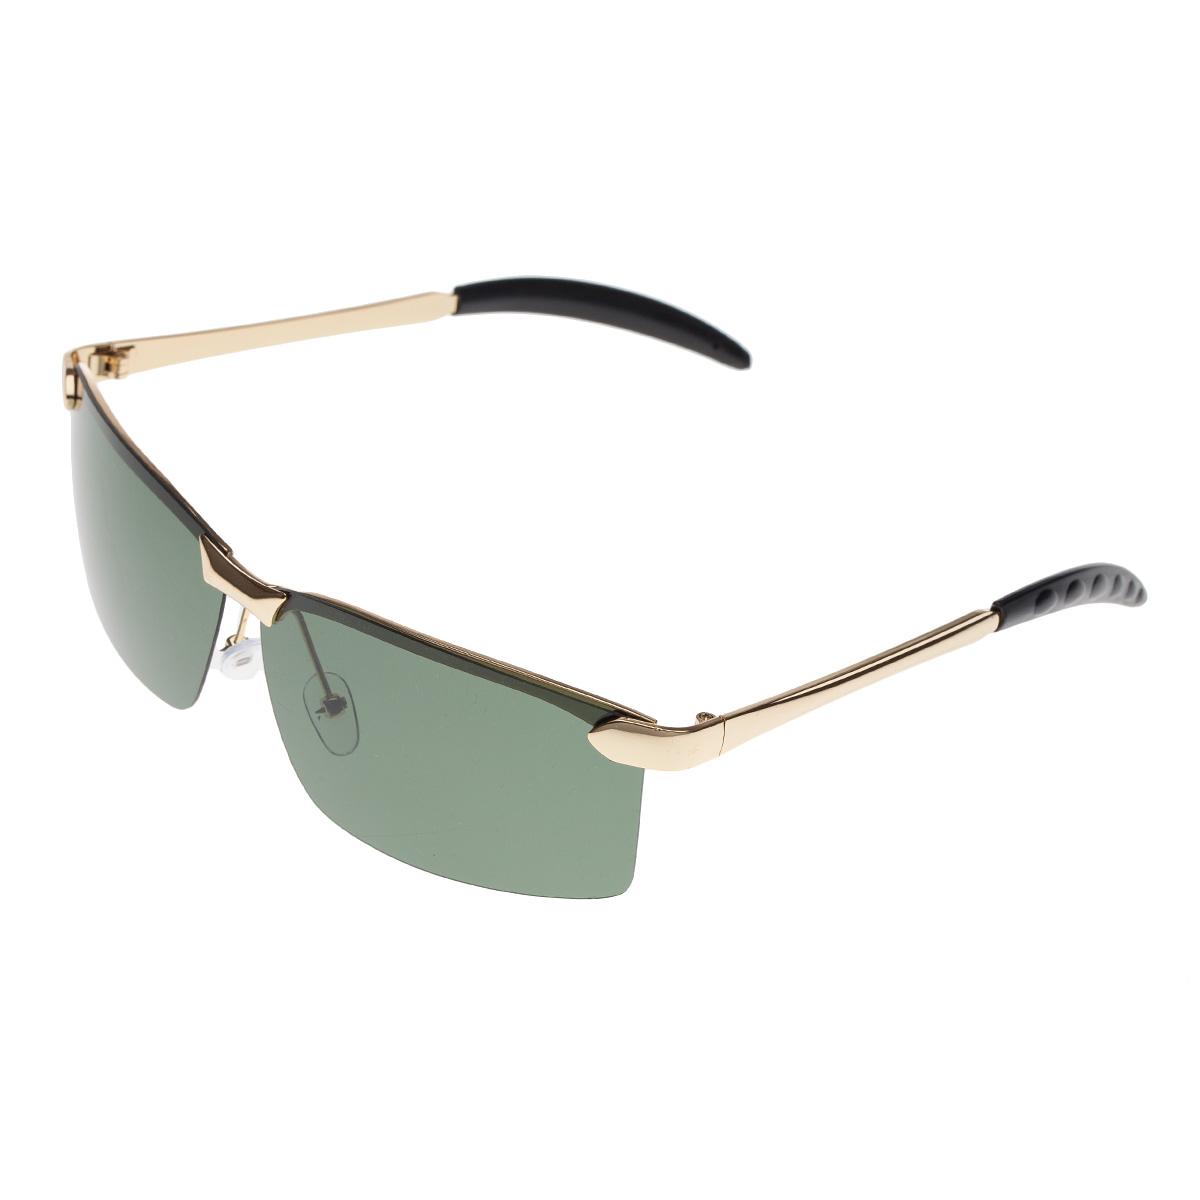 Фото - Очки солнцезащитные Sevenext, 23032-24 очки солнцезащитные sevenext 23032 28